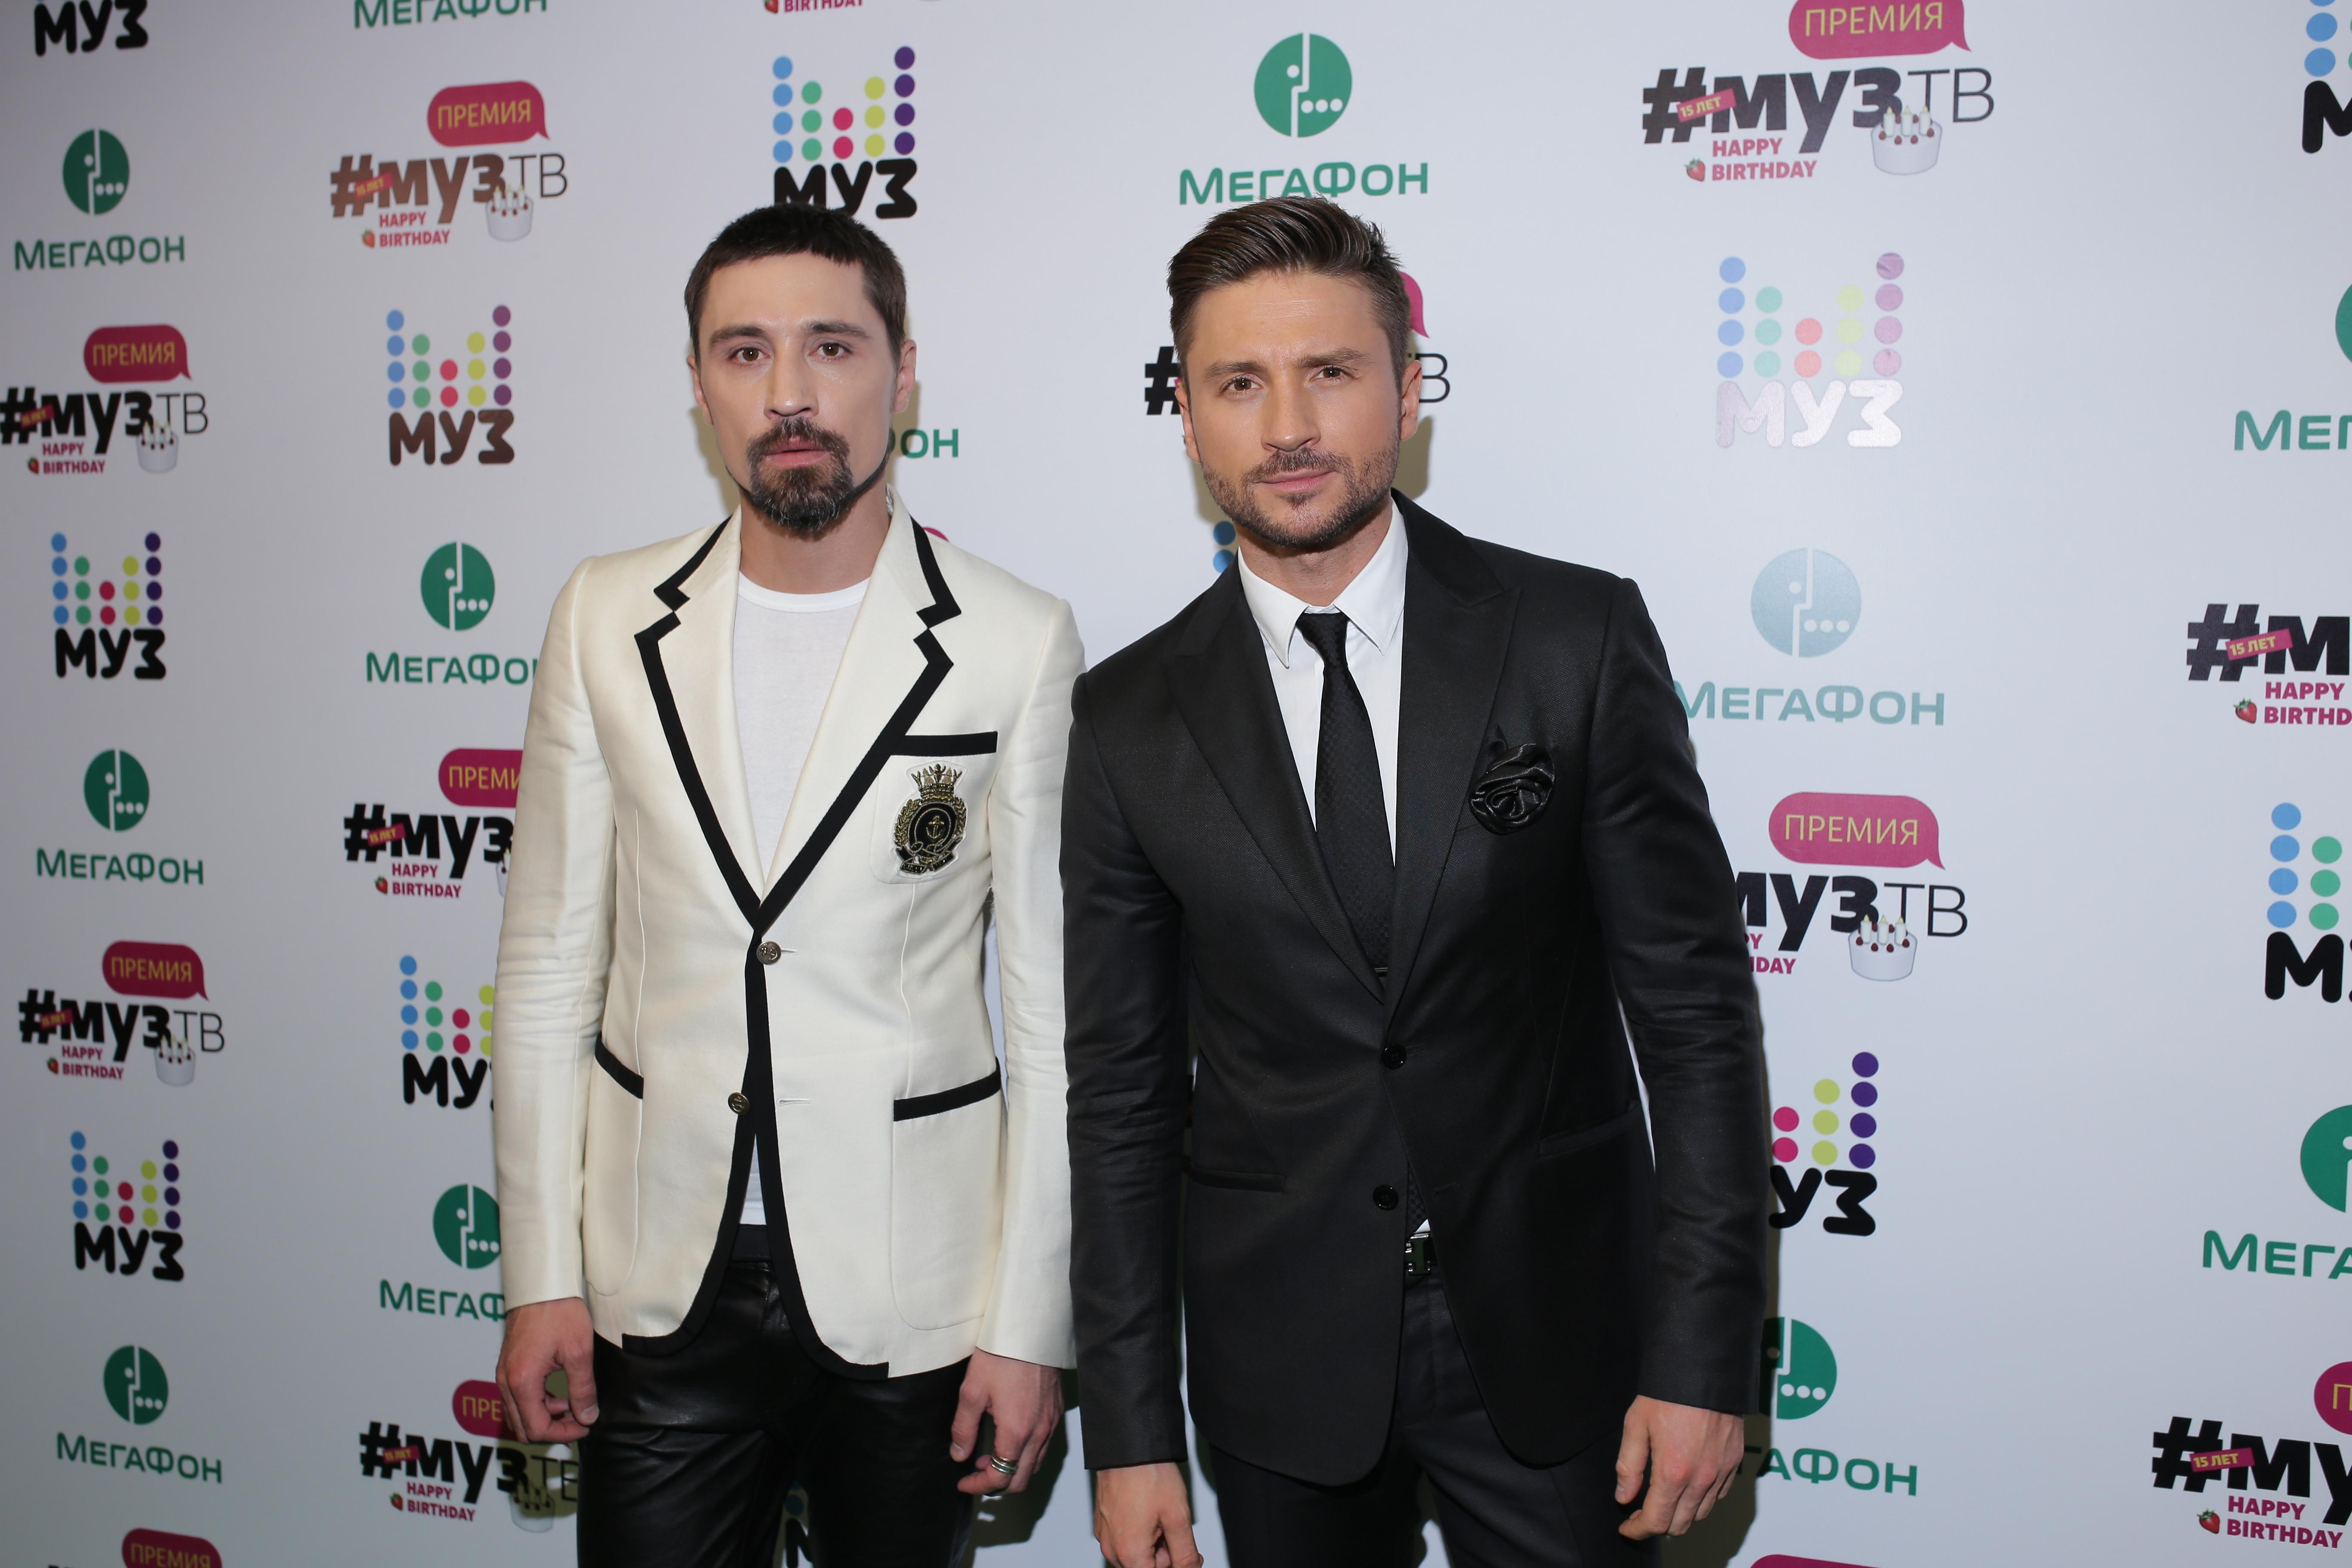 Дима Билан и Сергей Лазарев Фото: Пресс-служба Муз-ТВ